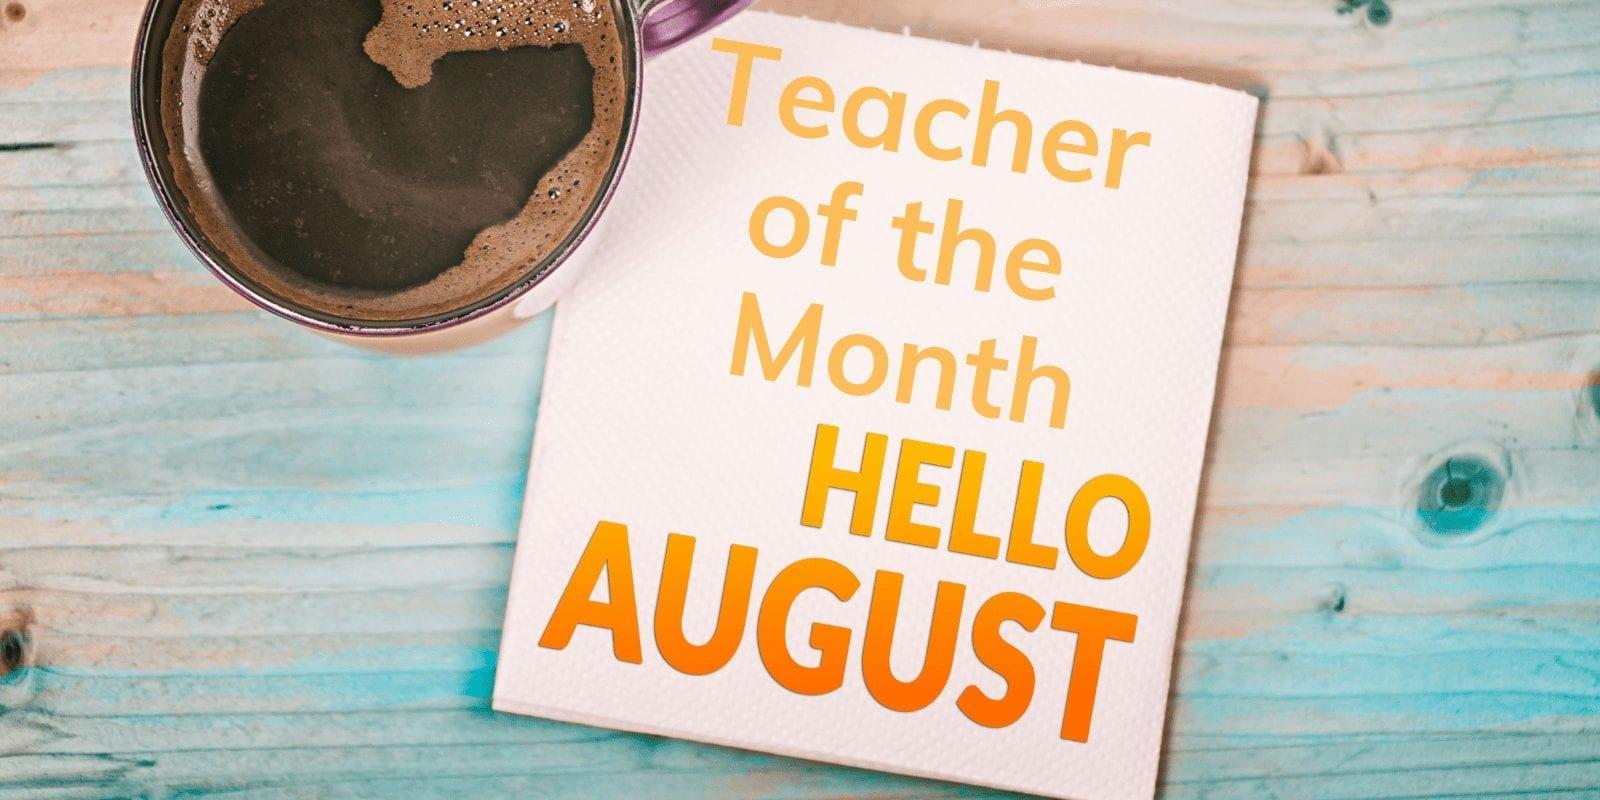 Little Sunshine's Playhouse Teacher of the Month August